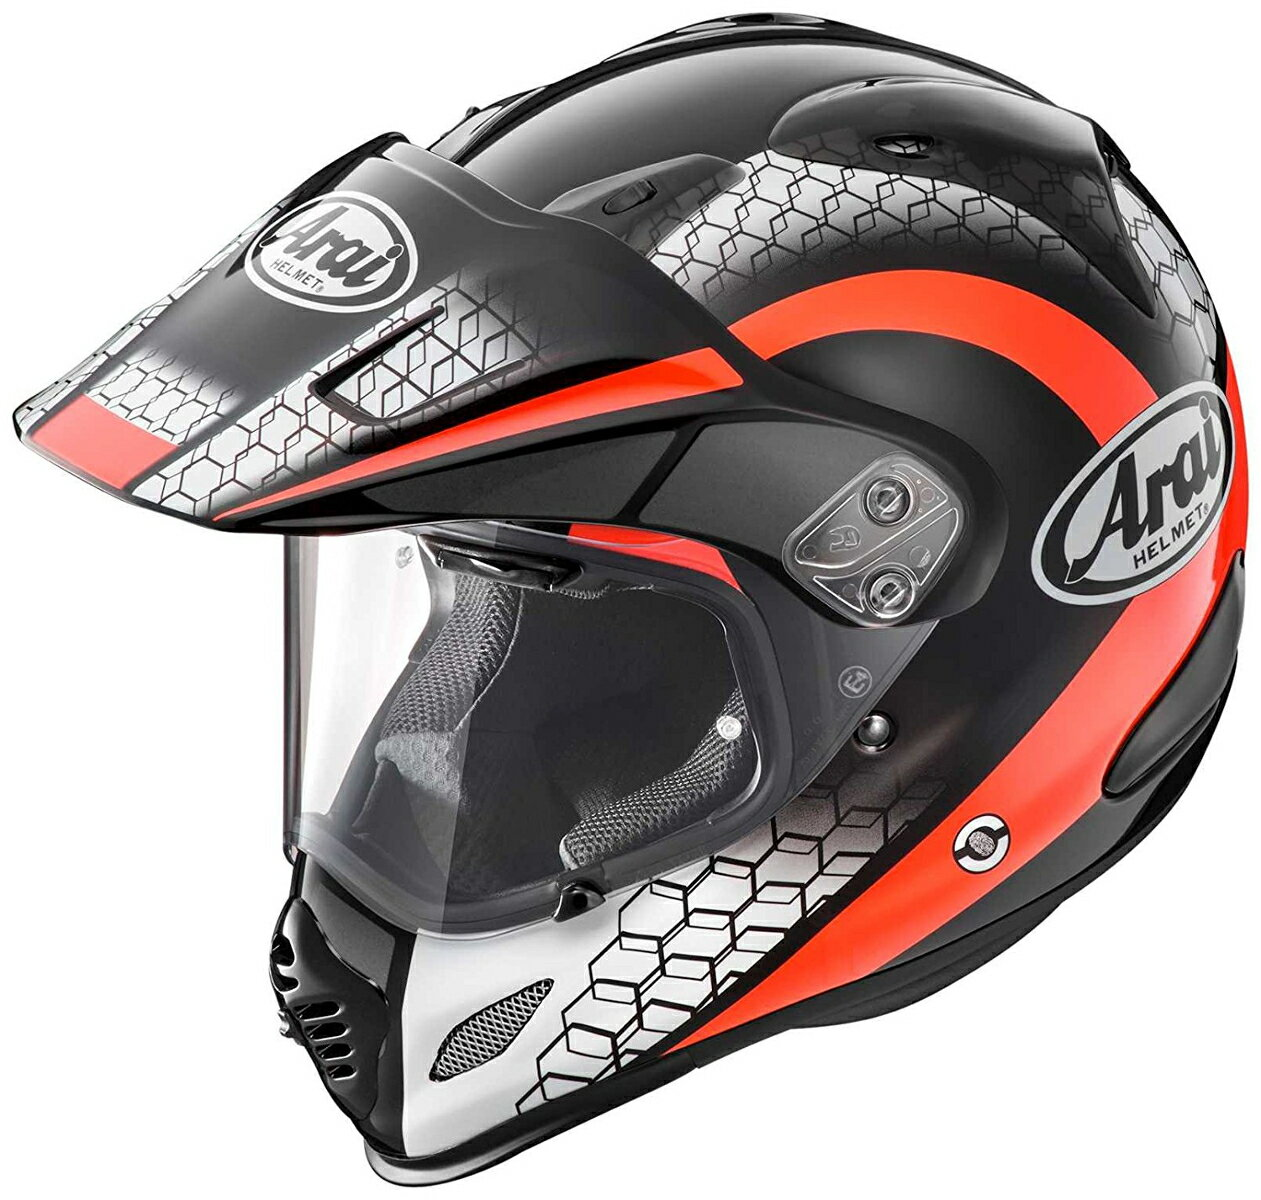 ARAI オフロードヘルメット TOUR-CROSS 3 MESH (メッシュ) レッド Mサイズ 57-58cm